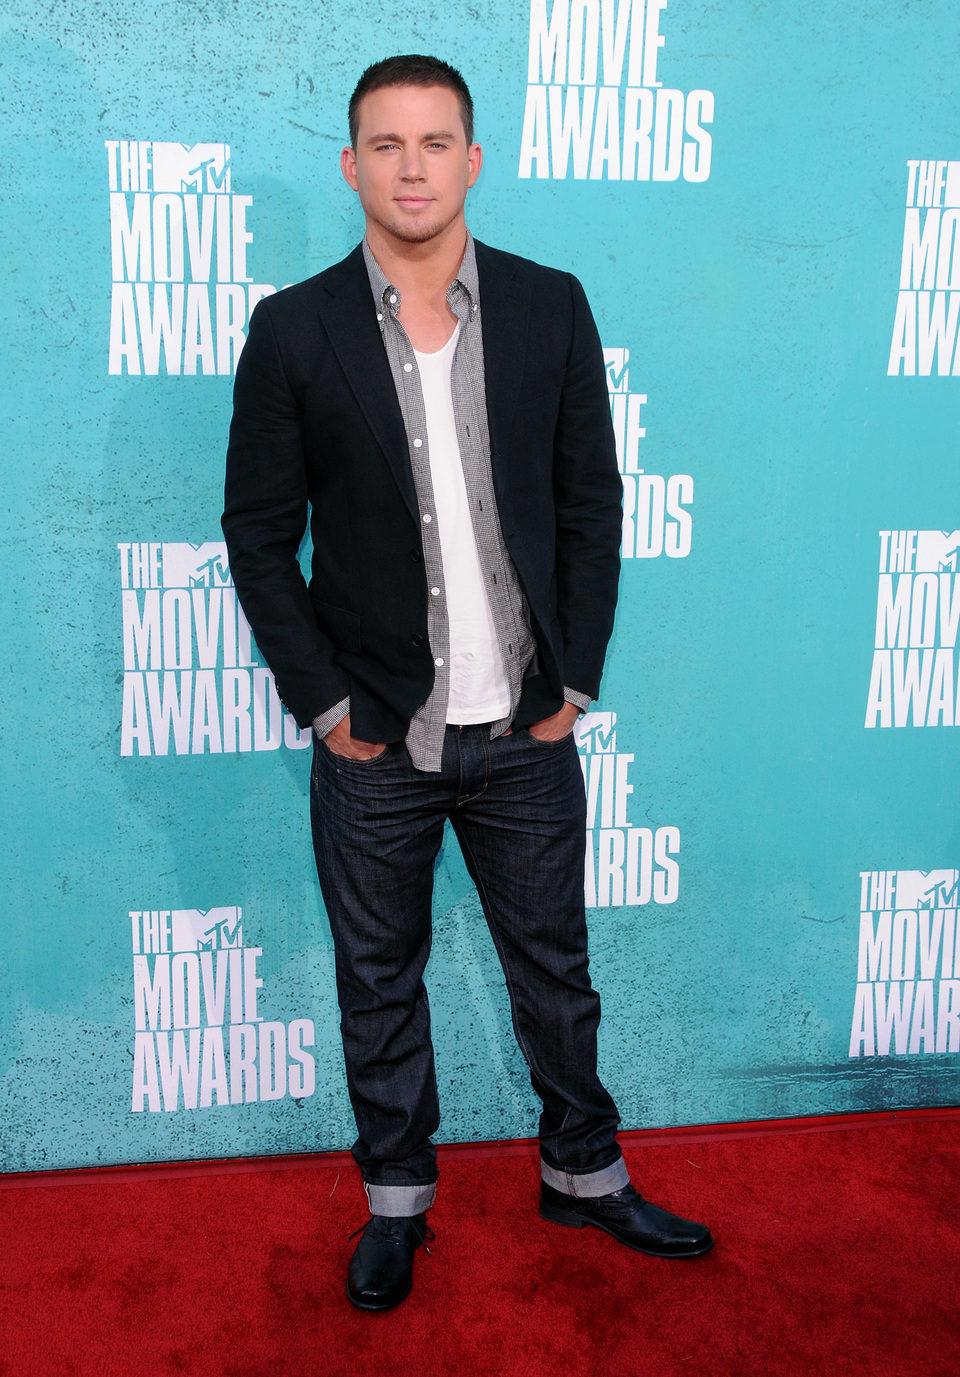 Channing Tatum en la alfombra roja de los MTV Movie Awards 2012